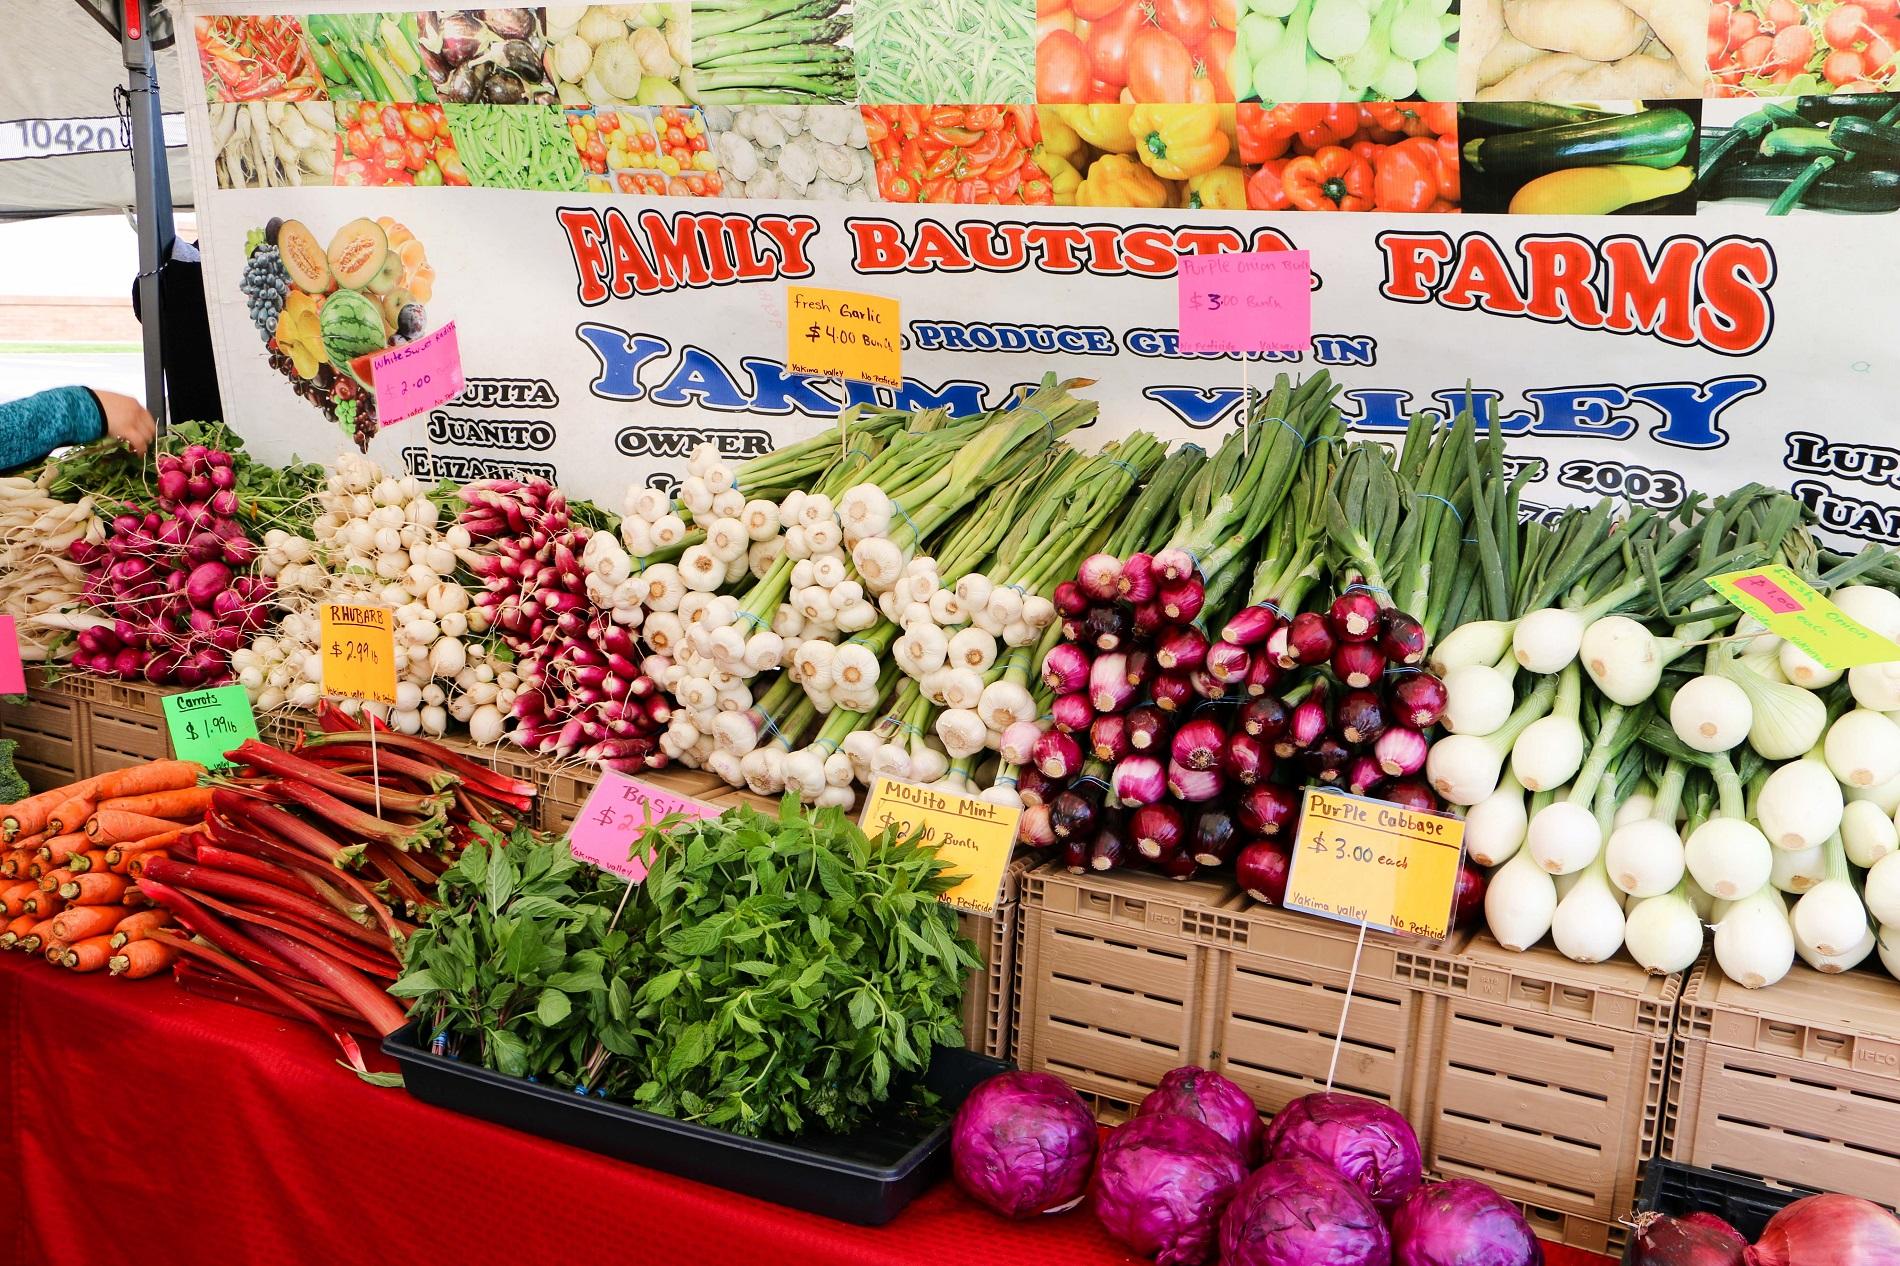 Bautista Family Farms at the Lakewood Farmers Market